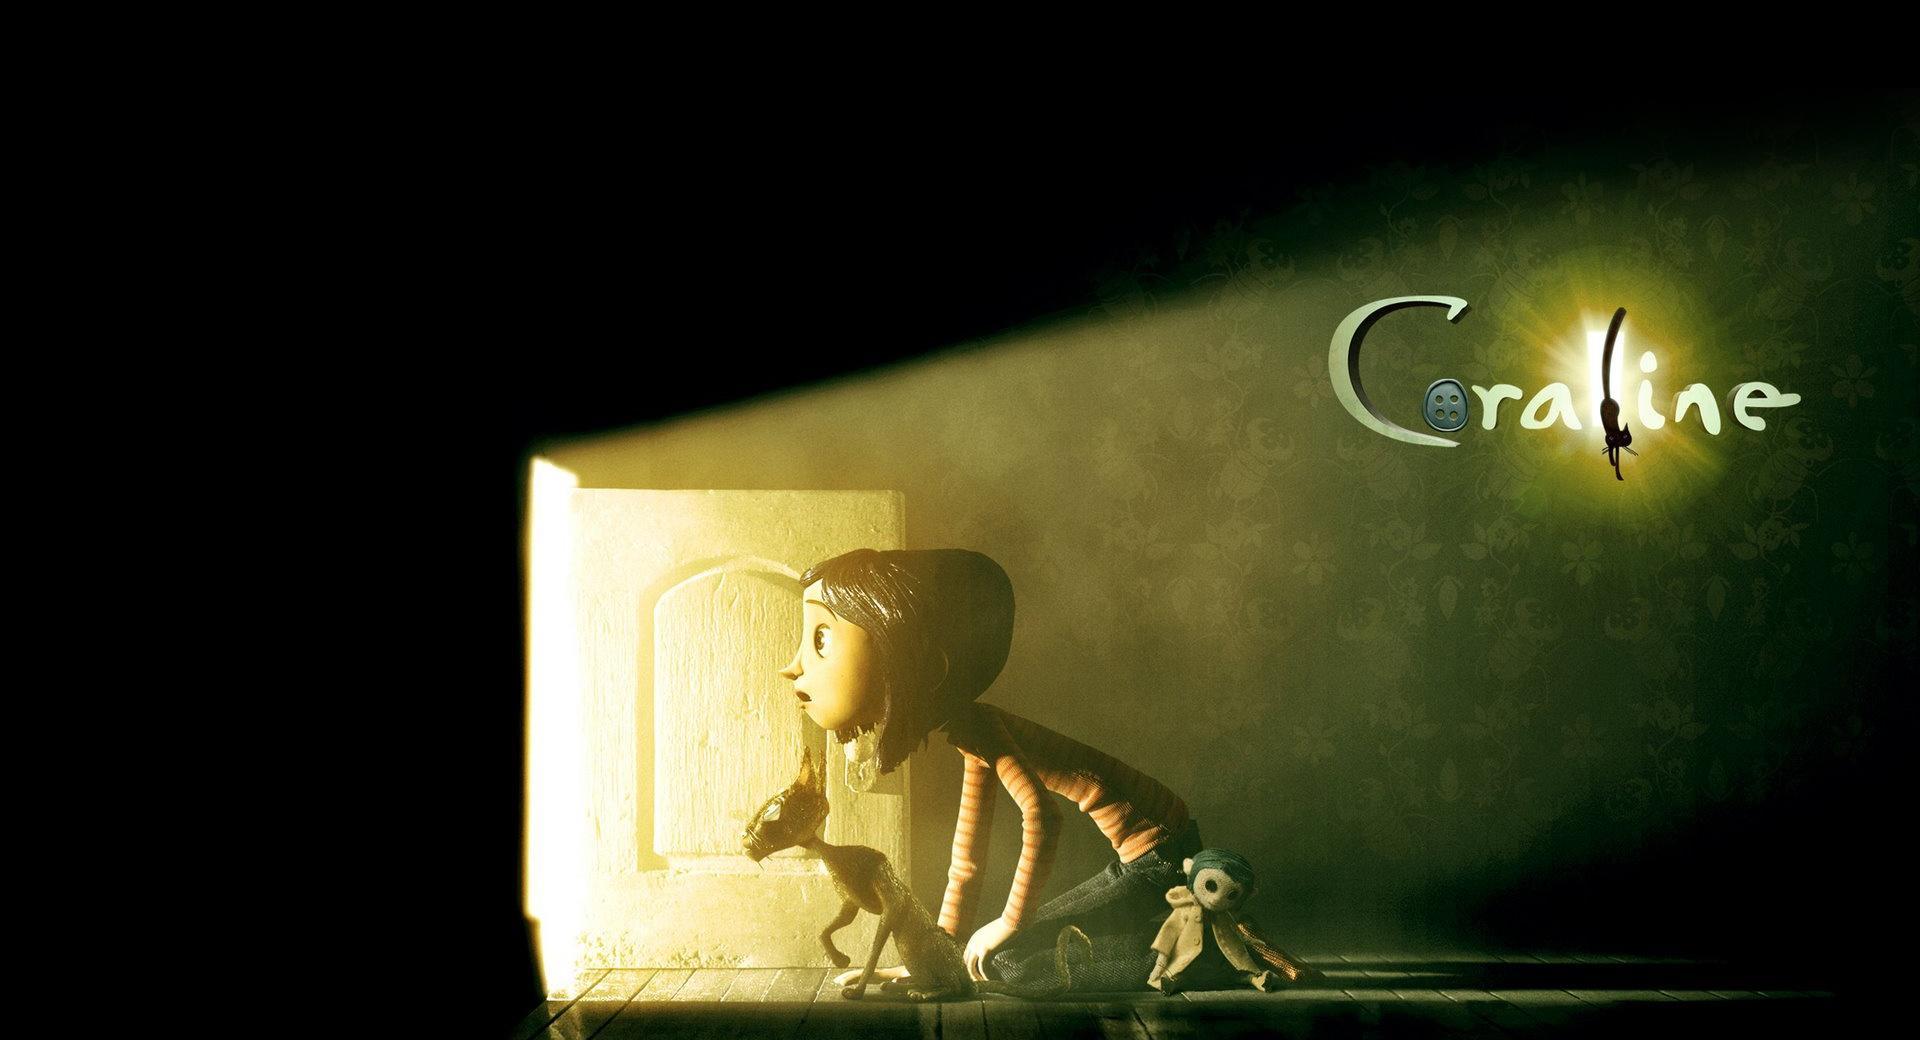 Dakota Fanning In Coraline wallpapers HD quality